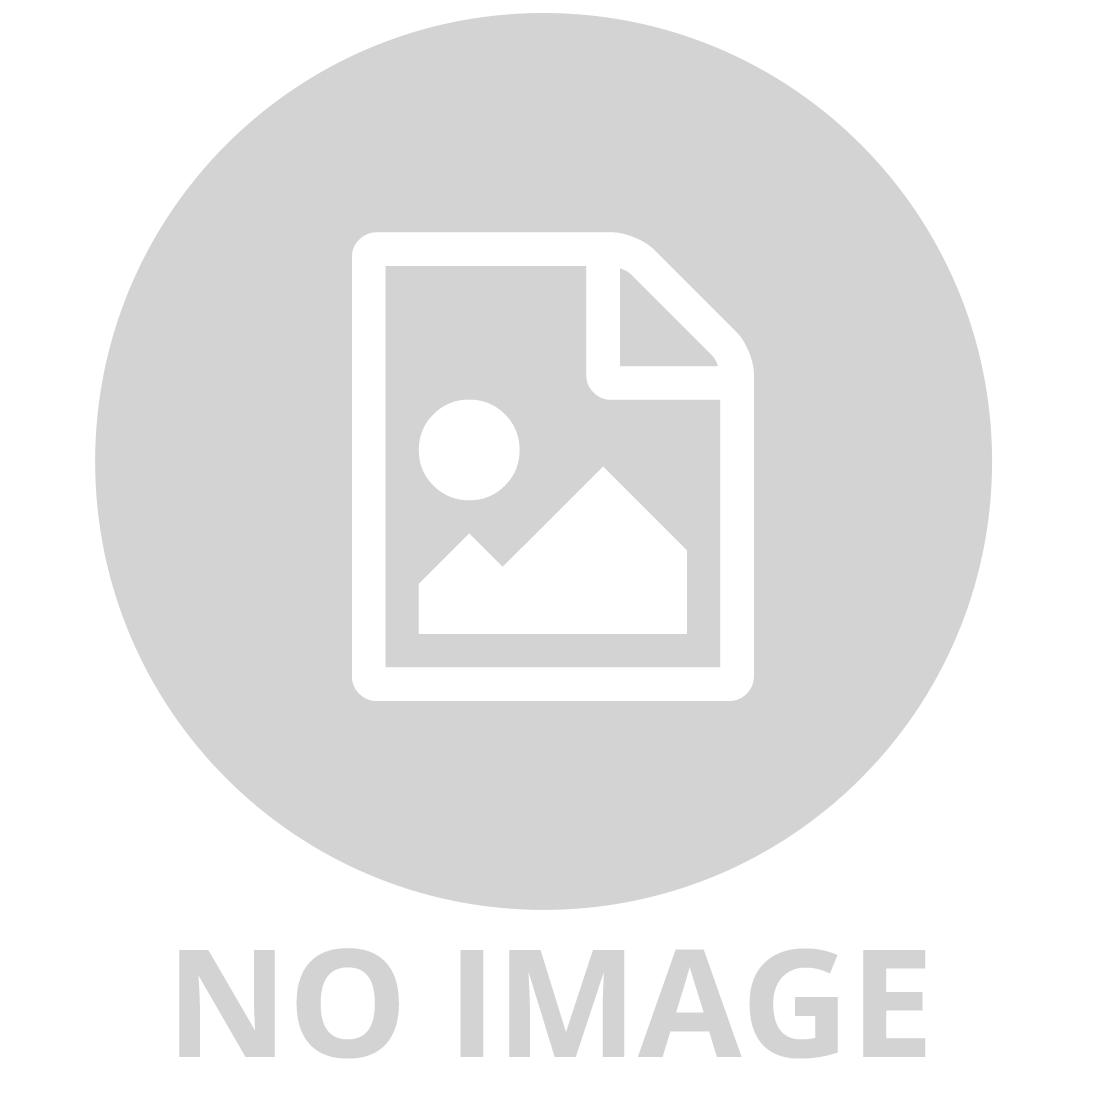 DISNEY PIXAR CARS3 - R/C ULTIMATE LIGHTNING MCQUEEN